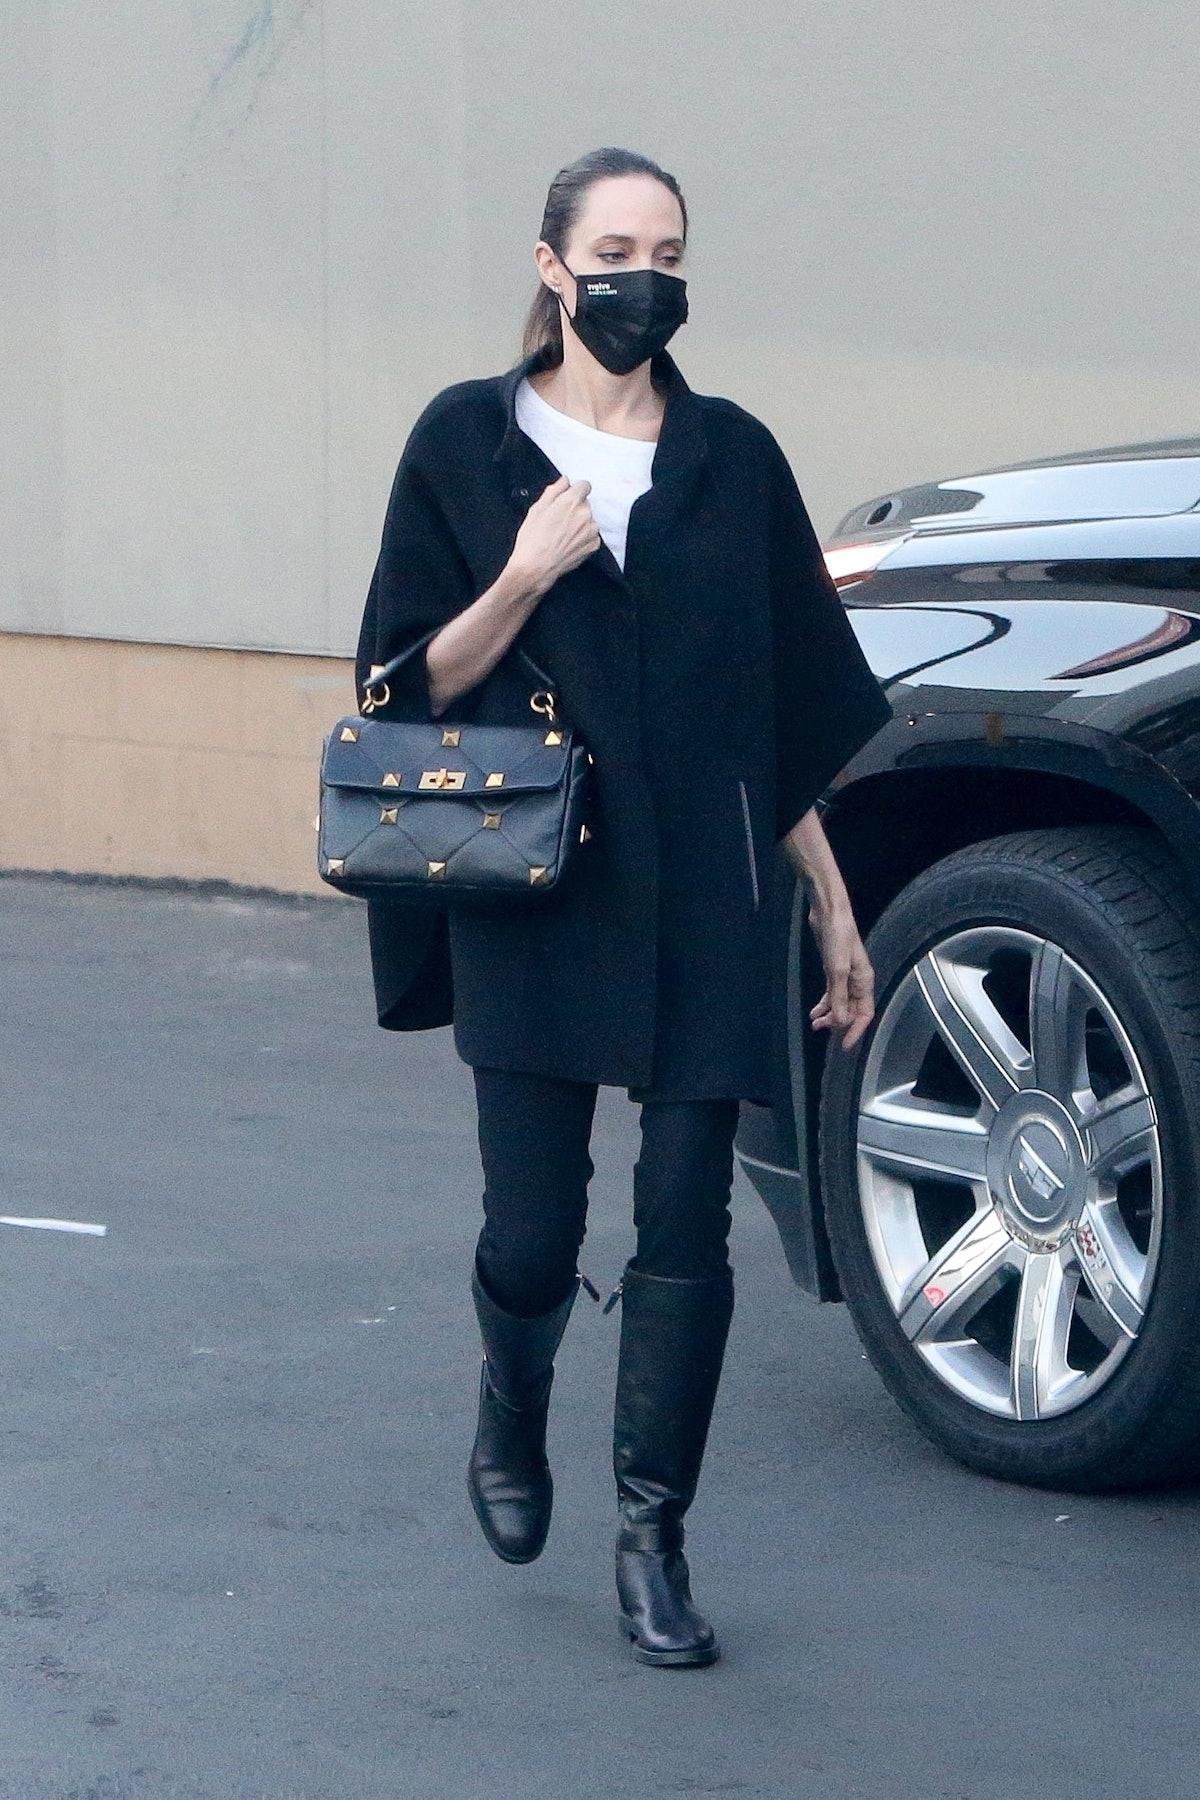 Angelina Jolie in Los Angeles, Califronia on December 6, 2020.